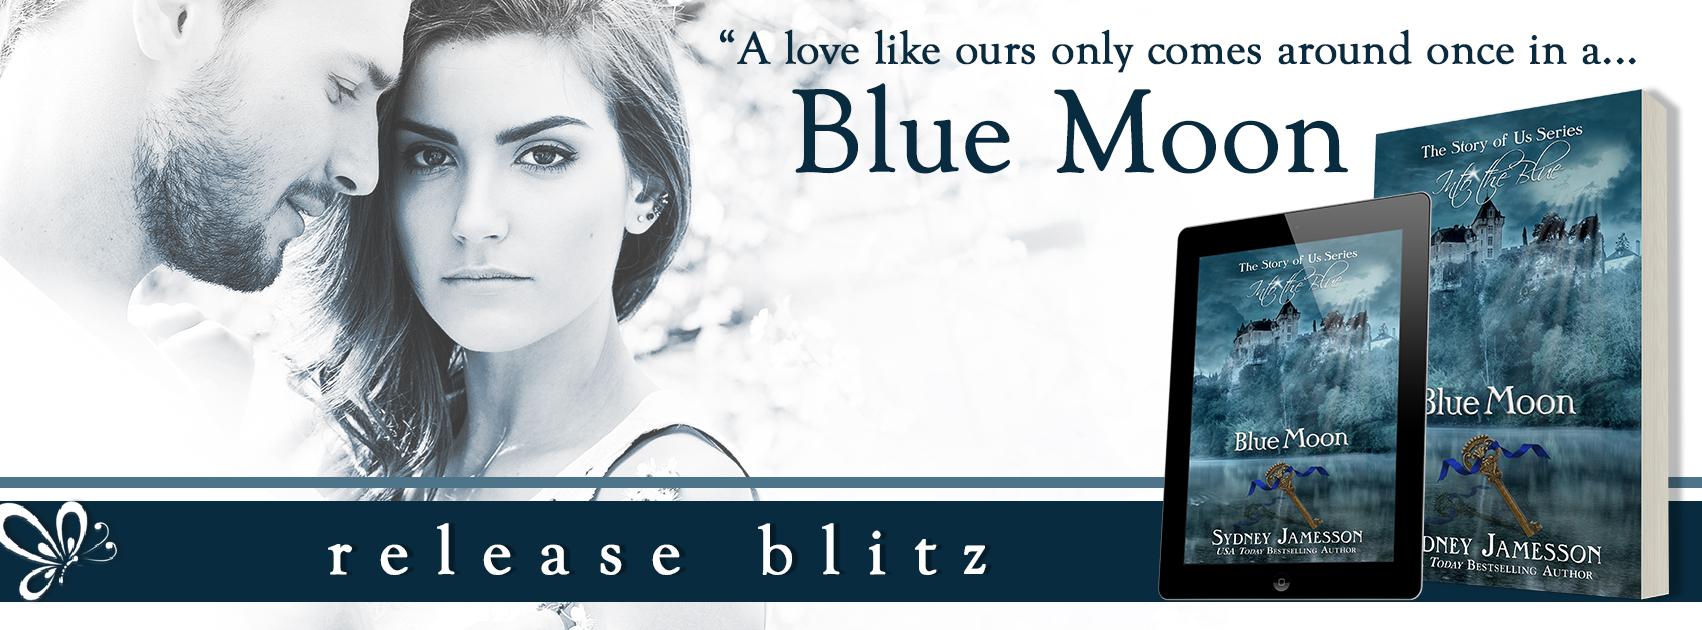 BLUE MOON SBPR Release Blitz.jpg